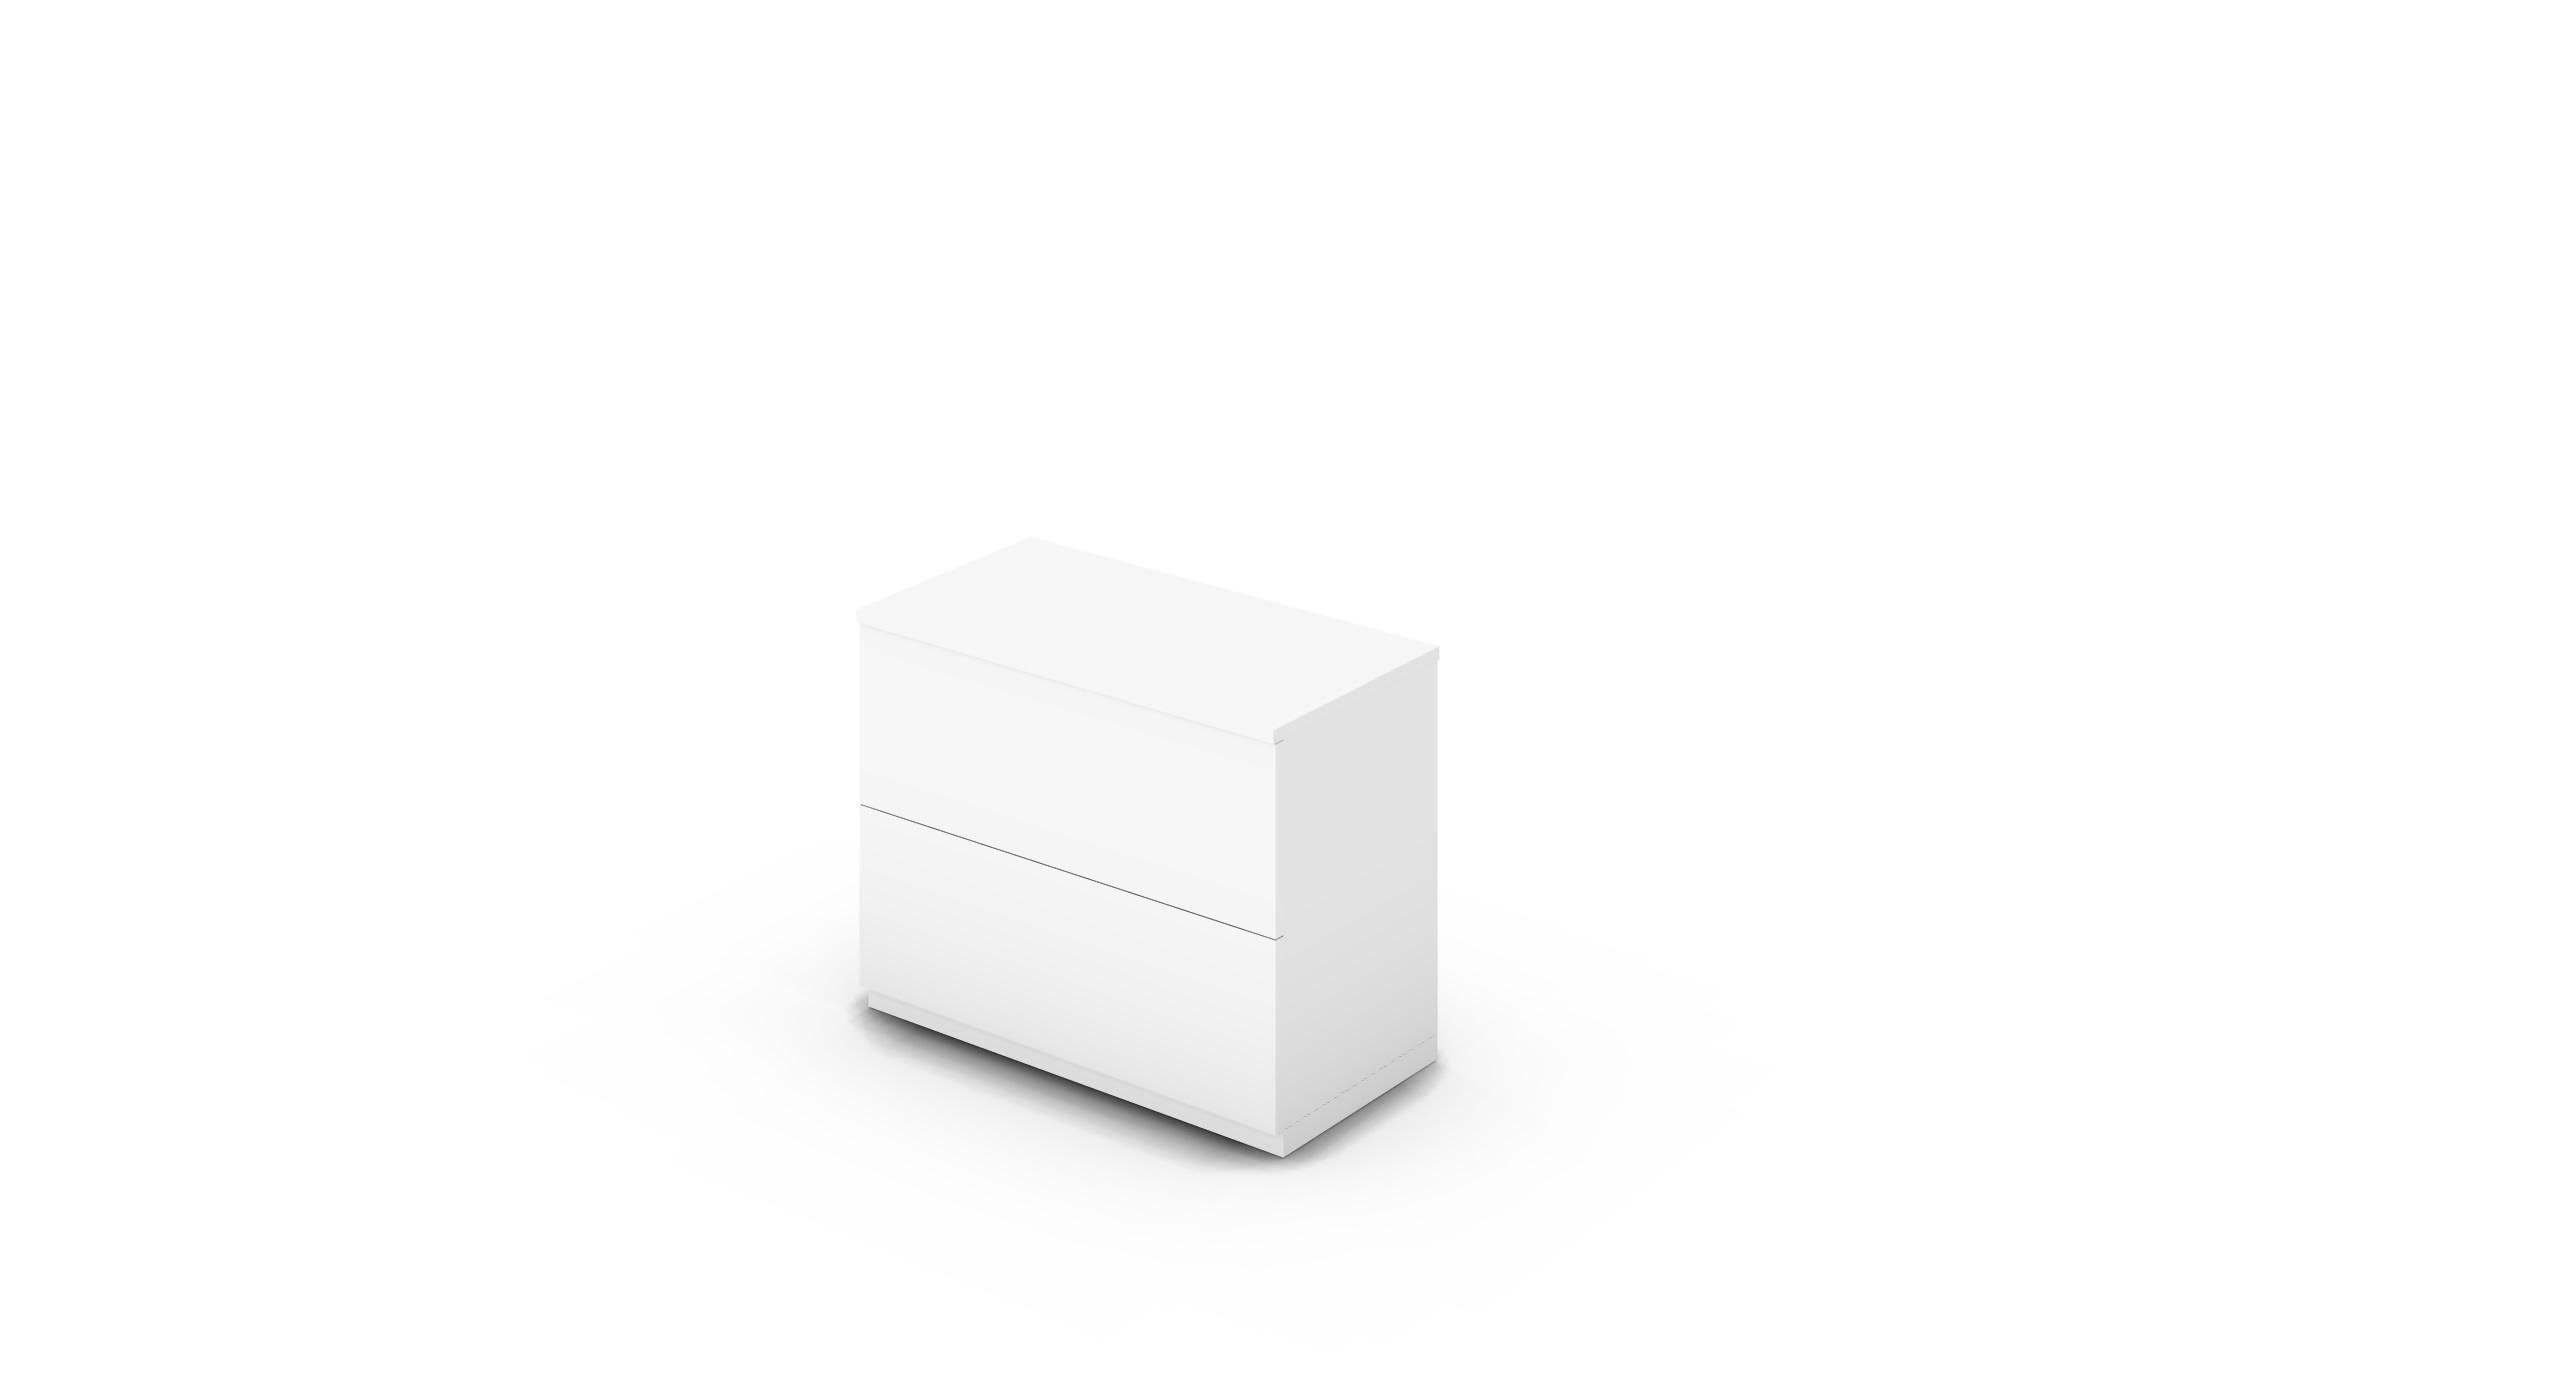 Cabinet_900x450x775_DR_White_Push_NoCylinder